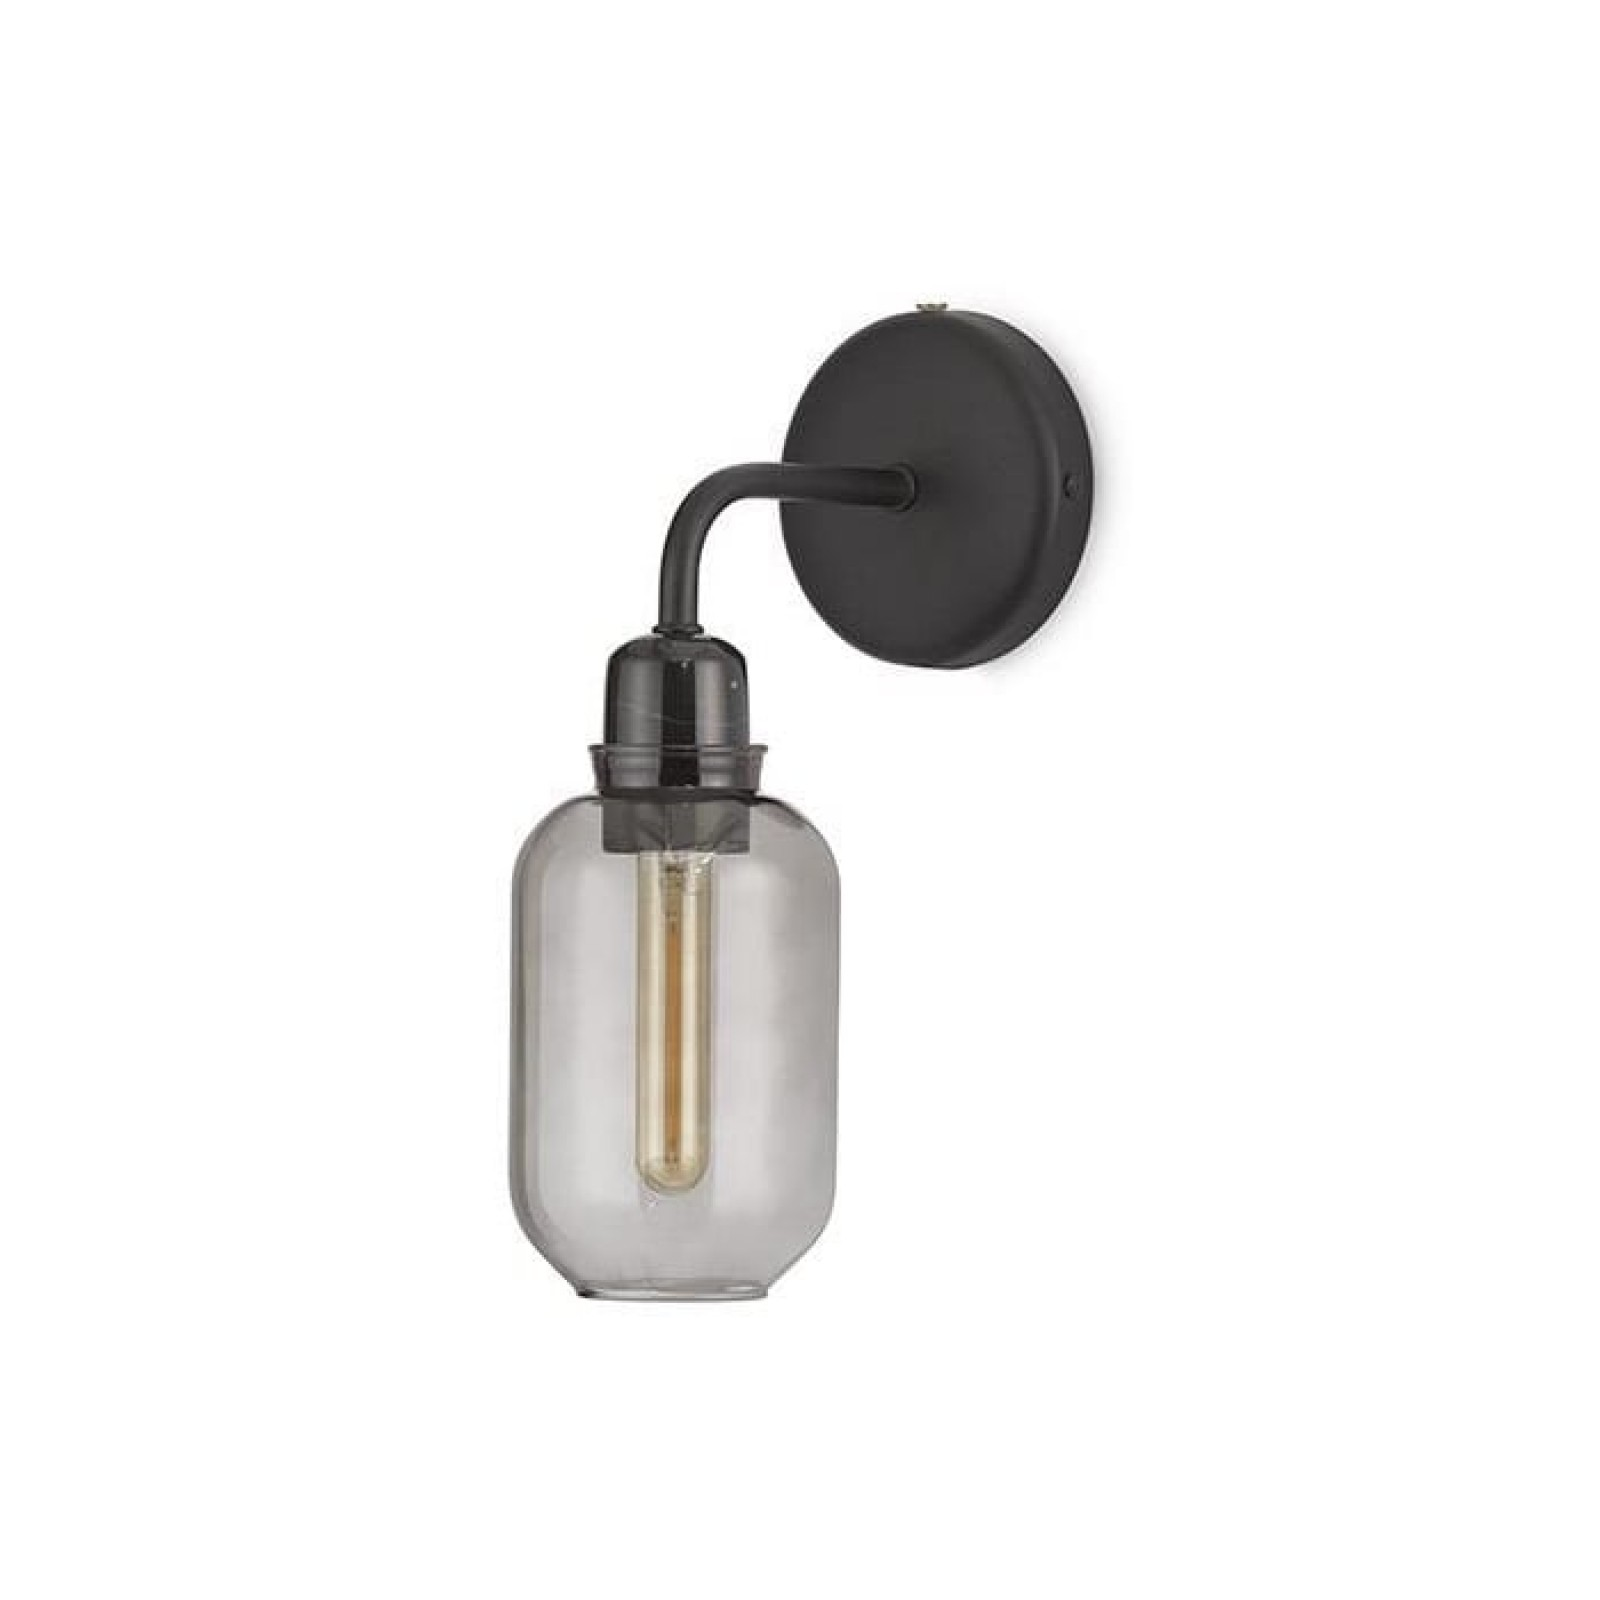 Amp Wall Lamp (Smoke / Black) - Normann Copenhagen